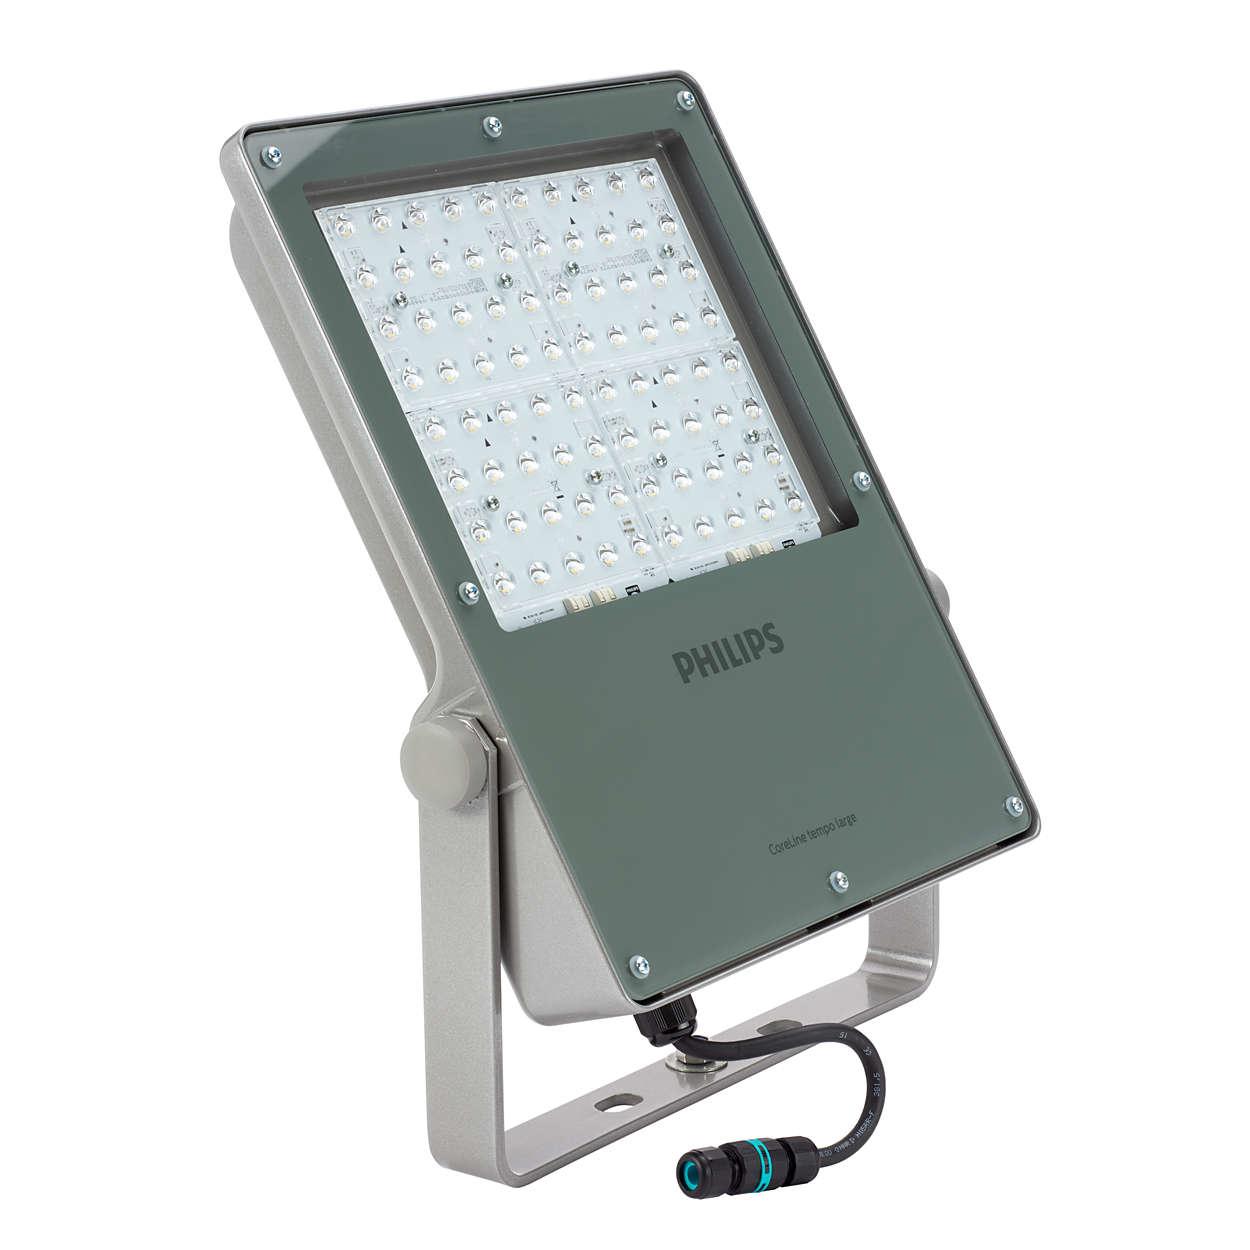 Philips Proiettore LED - BVP130 Tempo Large Asimmetrico - 09639700